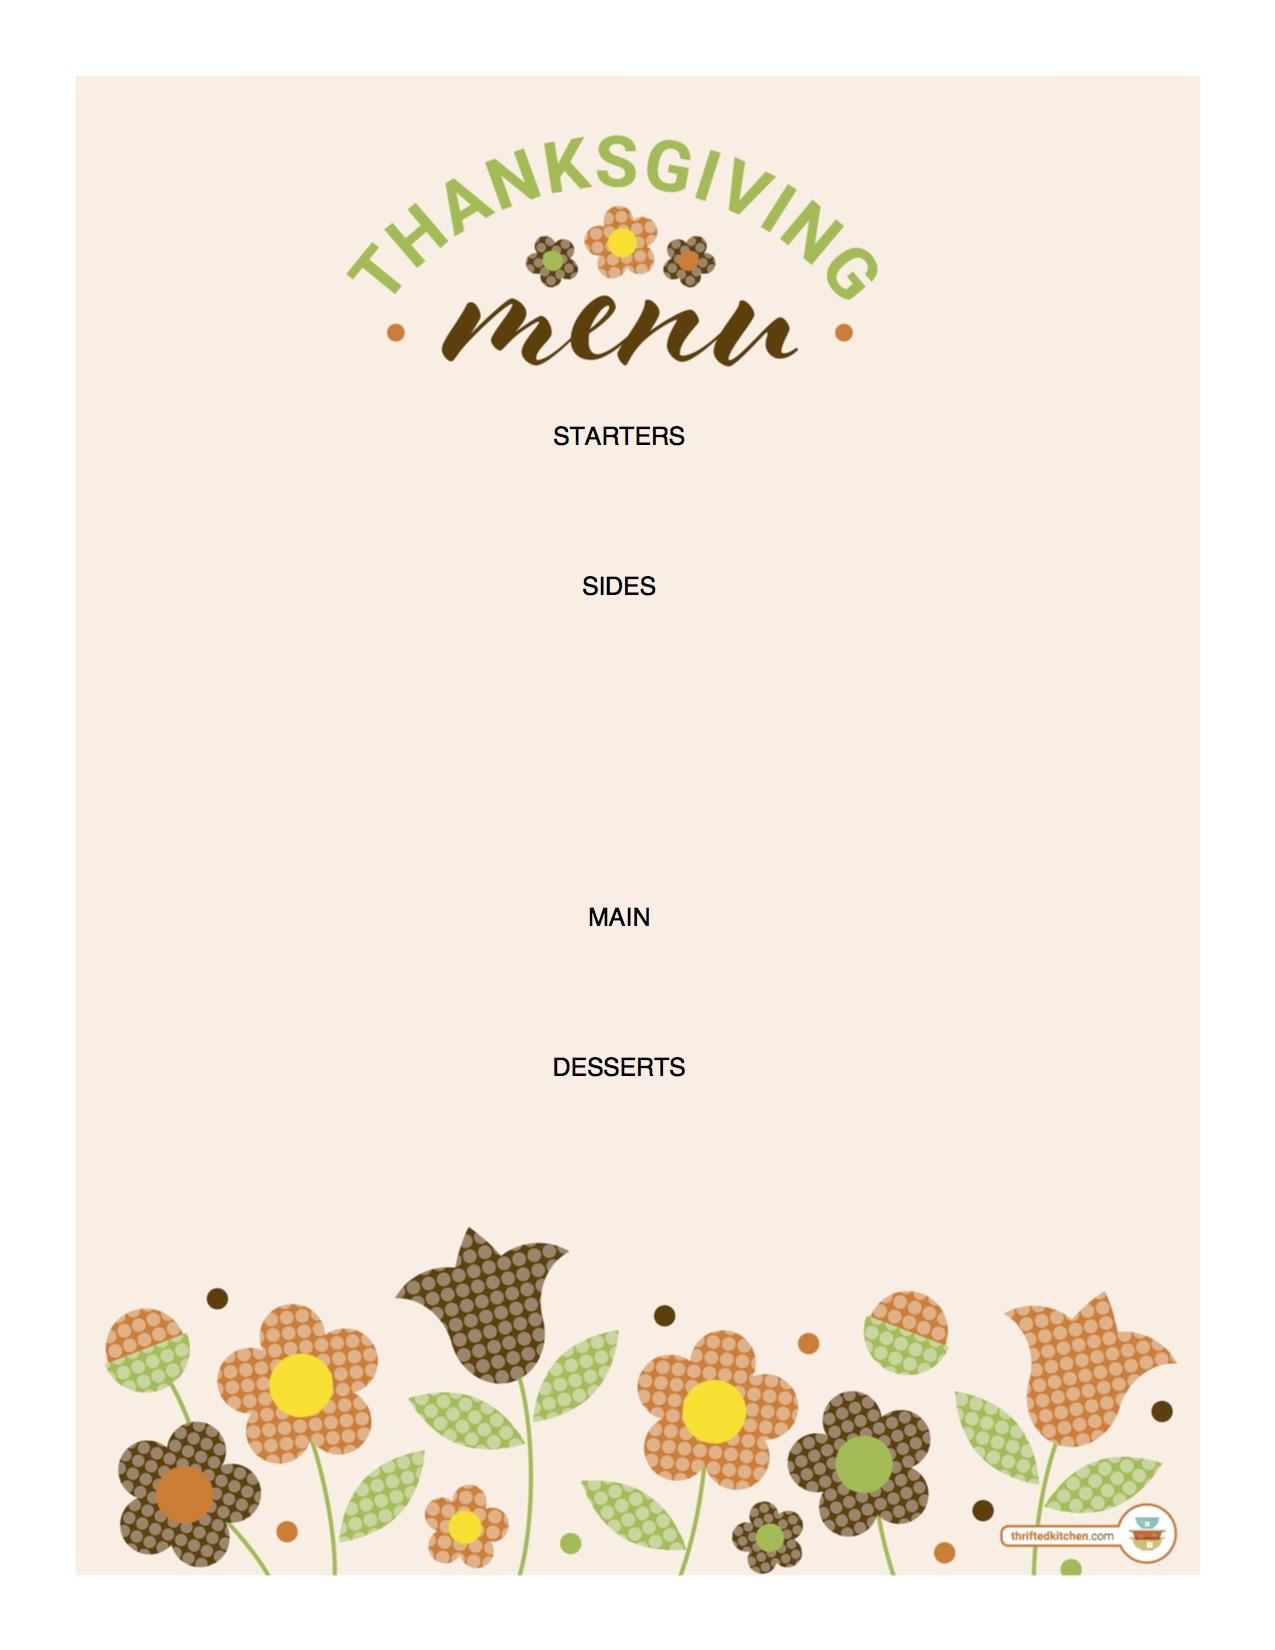 Thanksgiving menu template word vaydileforic thanksgiving menu template word maxwellsz